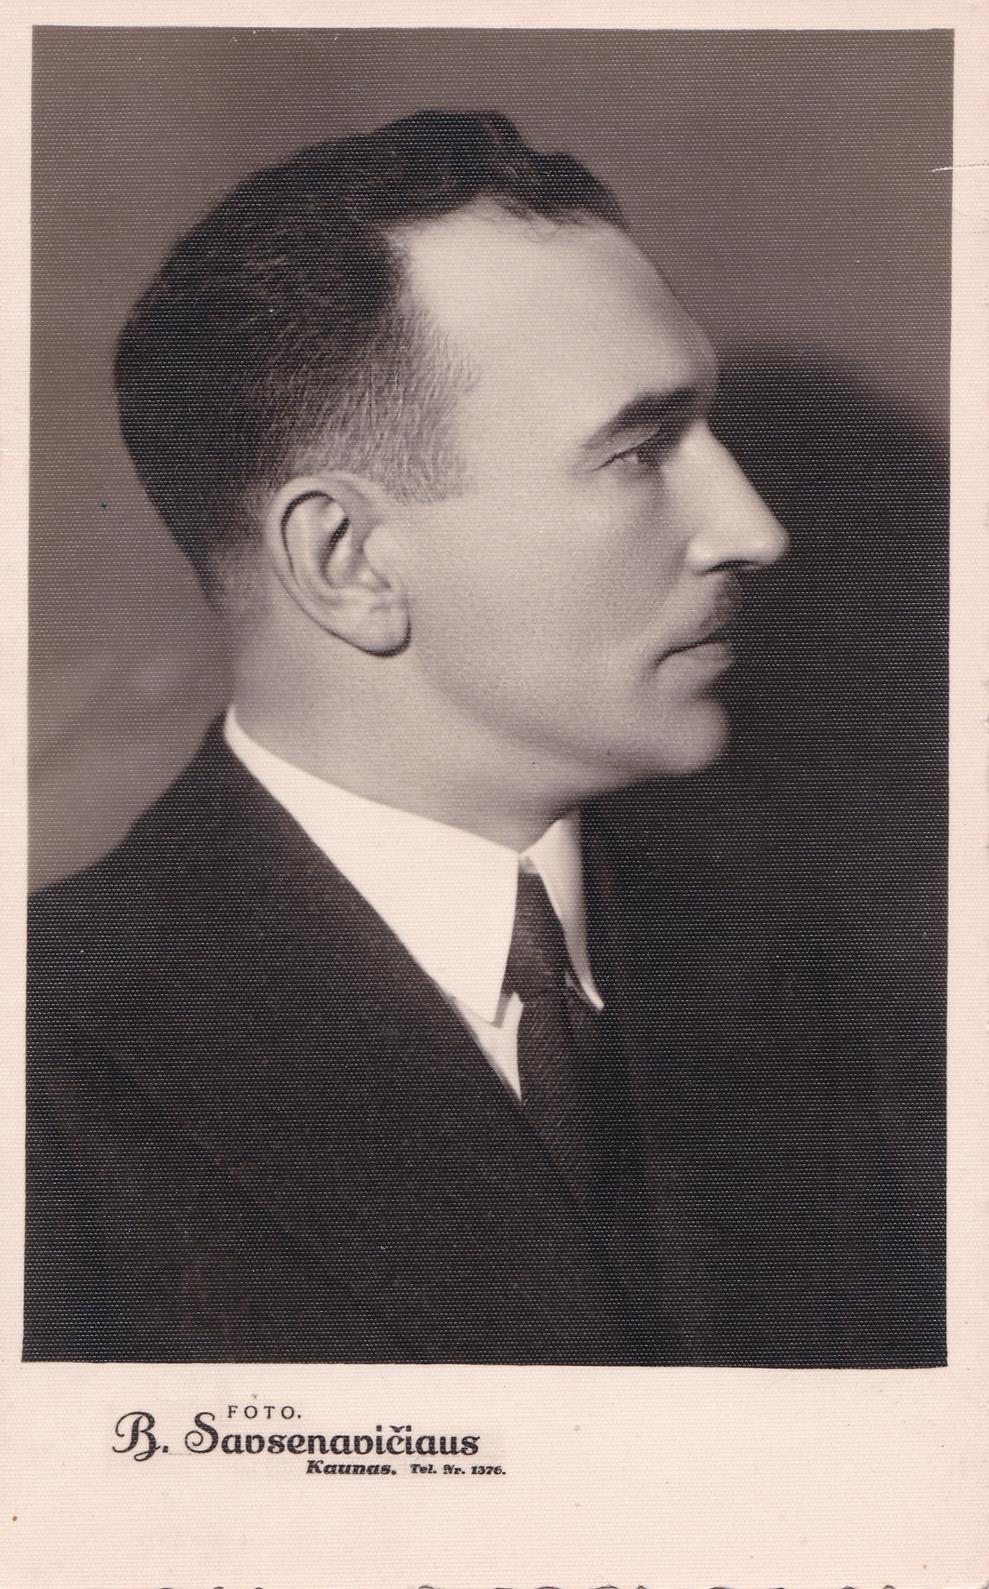 Kazimieras Skučas – Vidaus reikalų ministras. 1939 m. | V. Skučaitės archyvo nuotr.